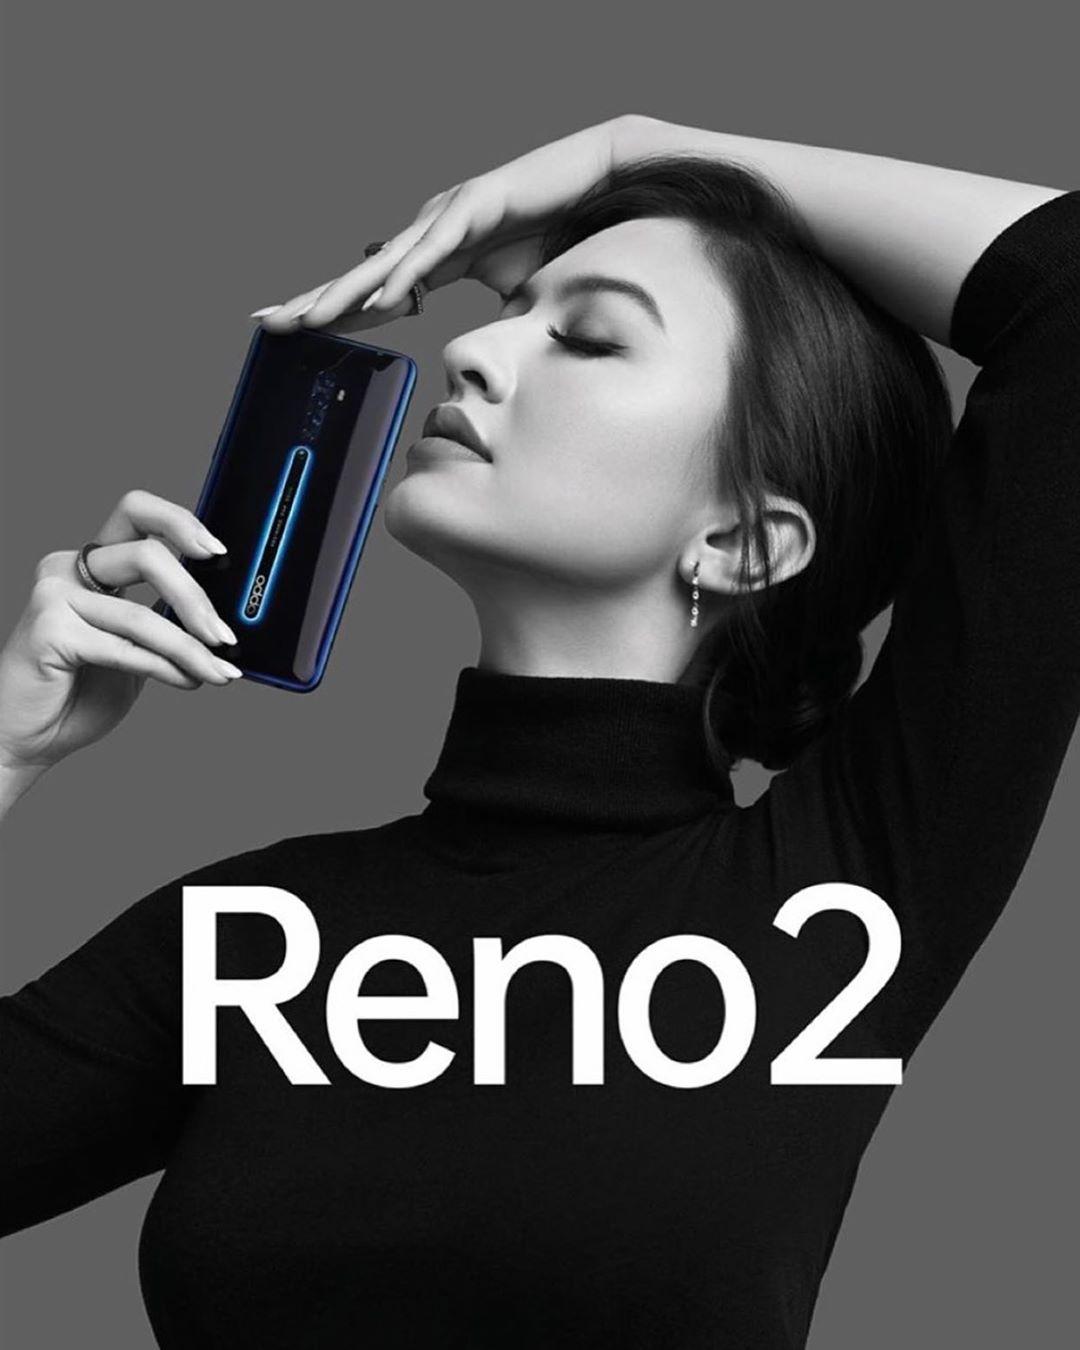 Shabura for OPPO RENO2